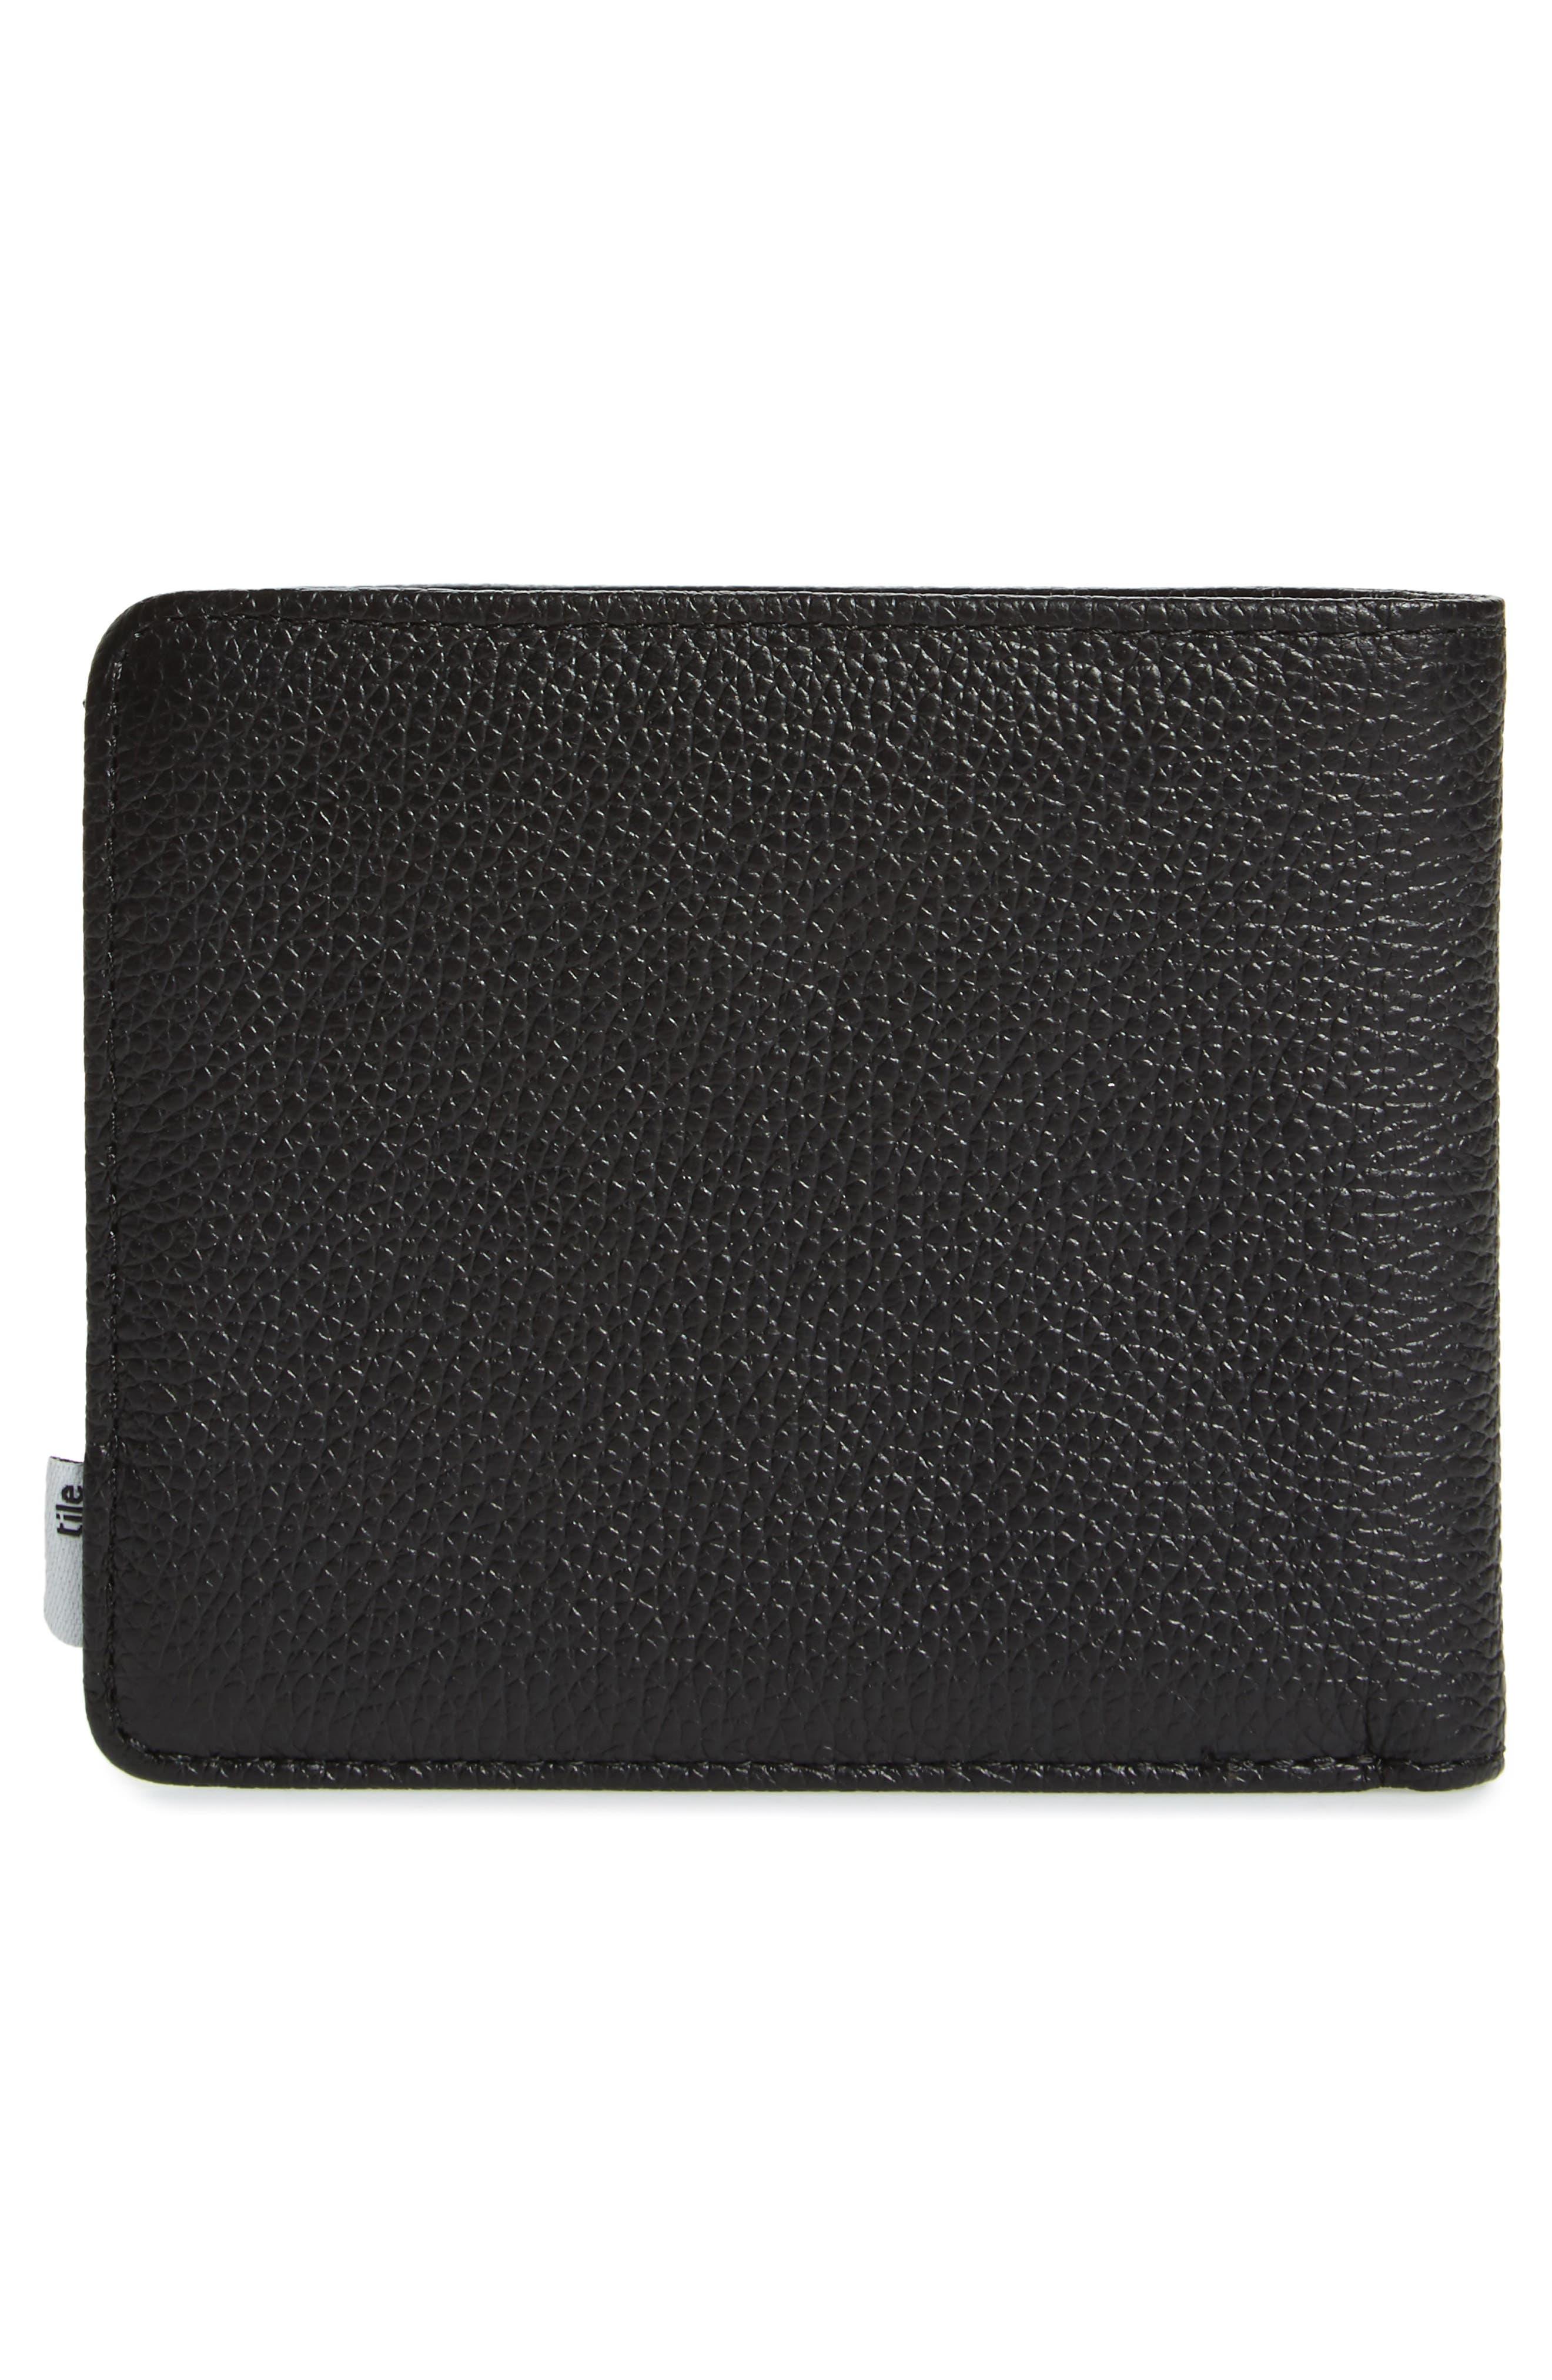 Tile Roy Leather Bifold Wallet,                             Alternate thumbnail 3, color,                             BLACK PEBBLED LEATHER